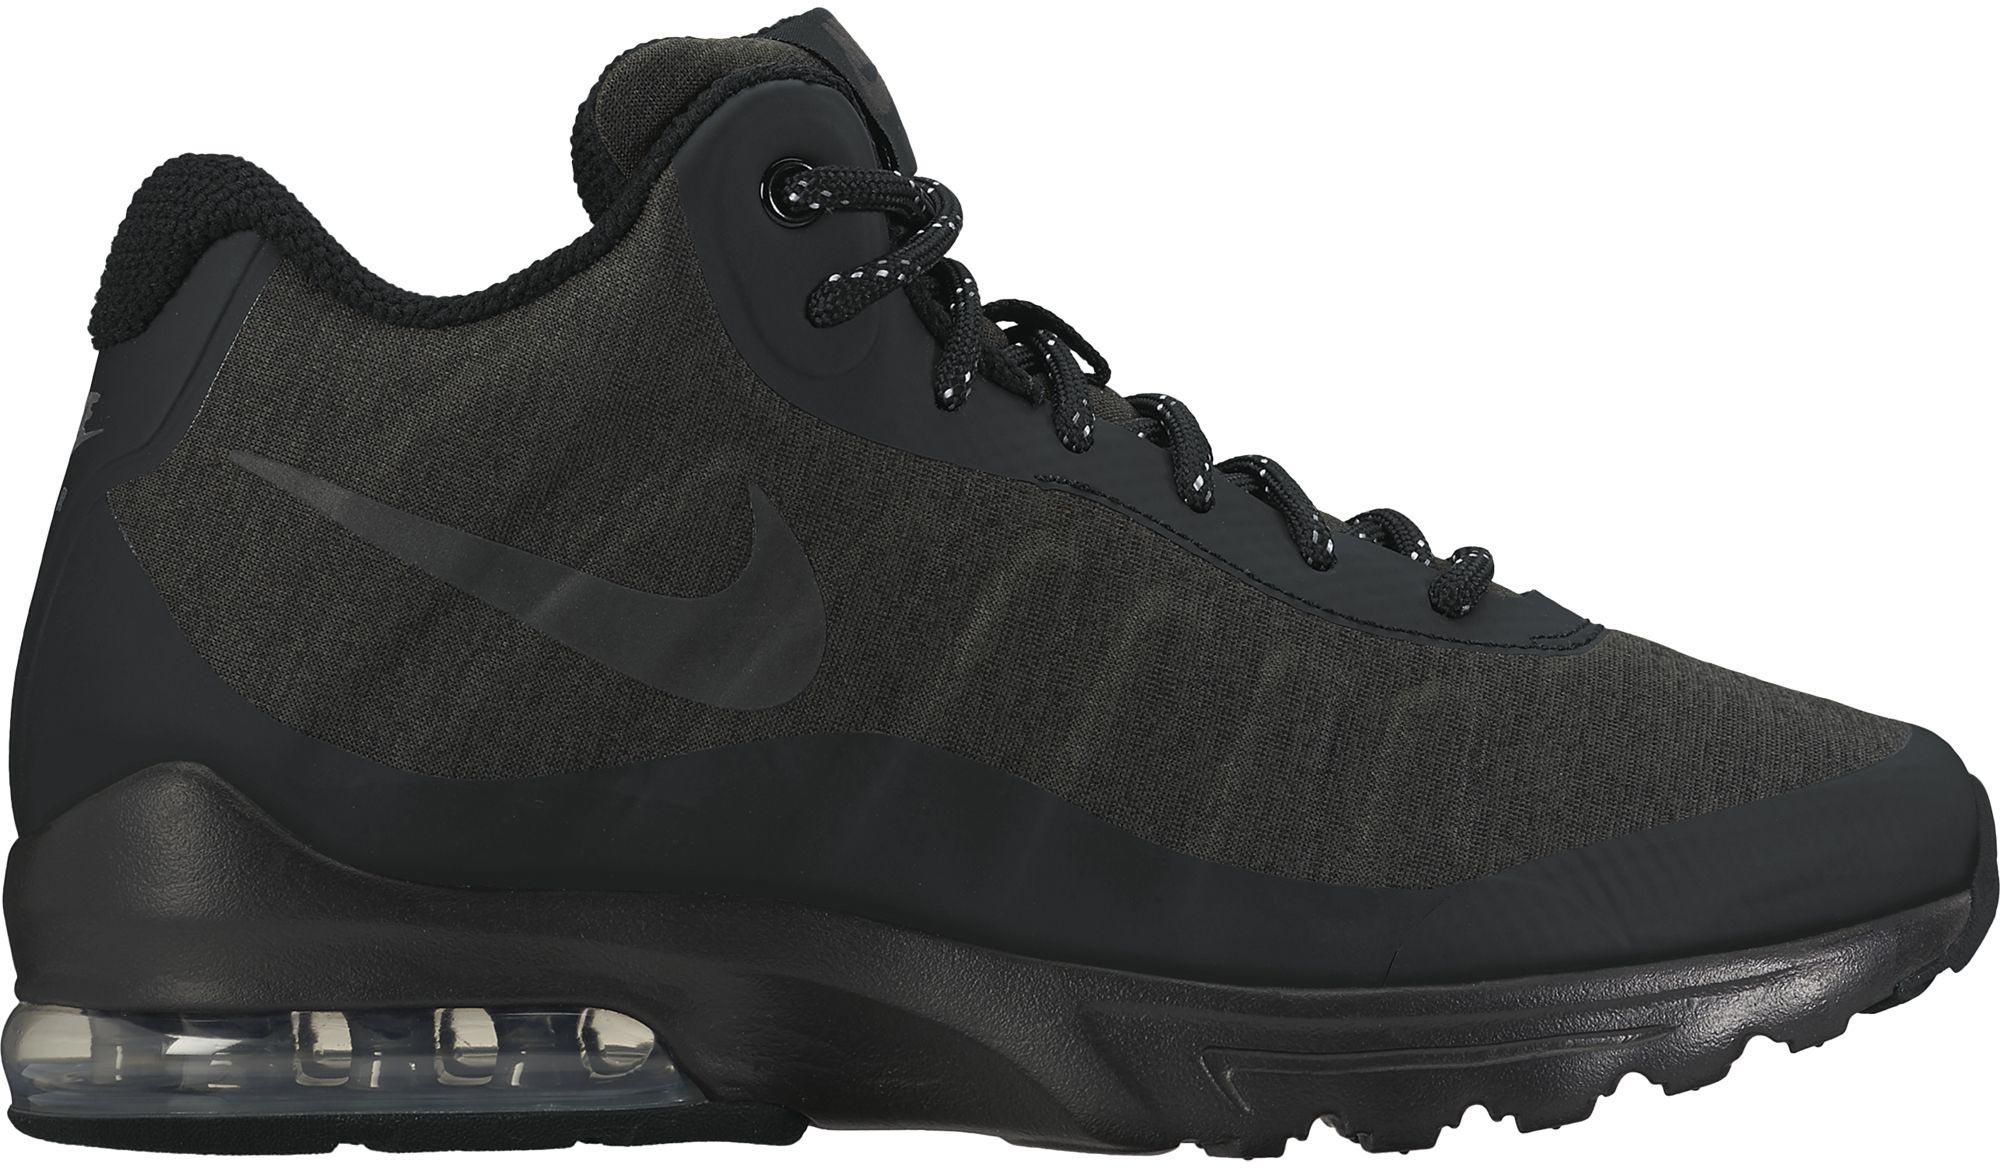 e73673cc8c15 ... france nike air max invigor mid top shoe b3fcd eaf0b ...